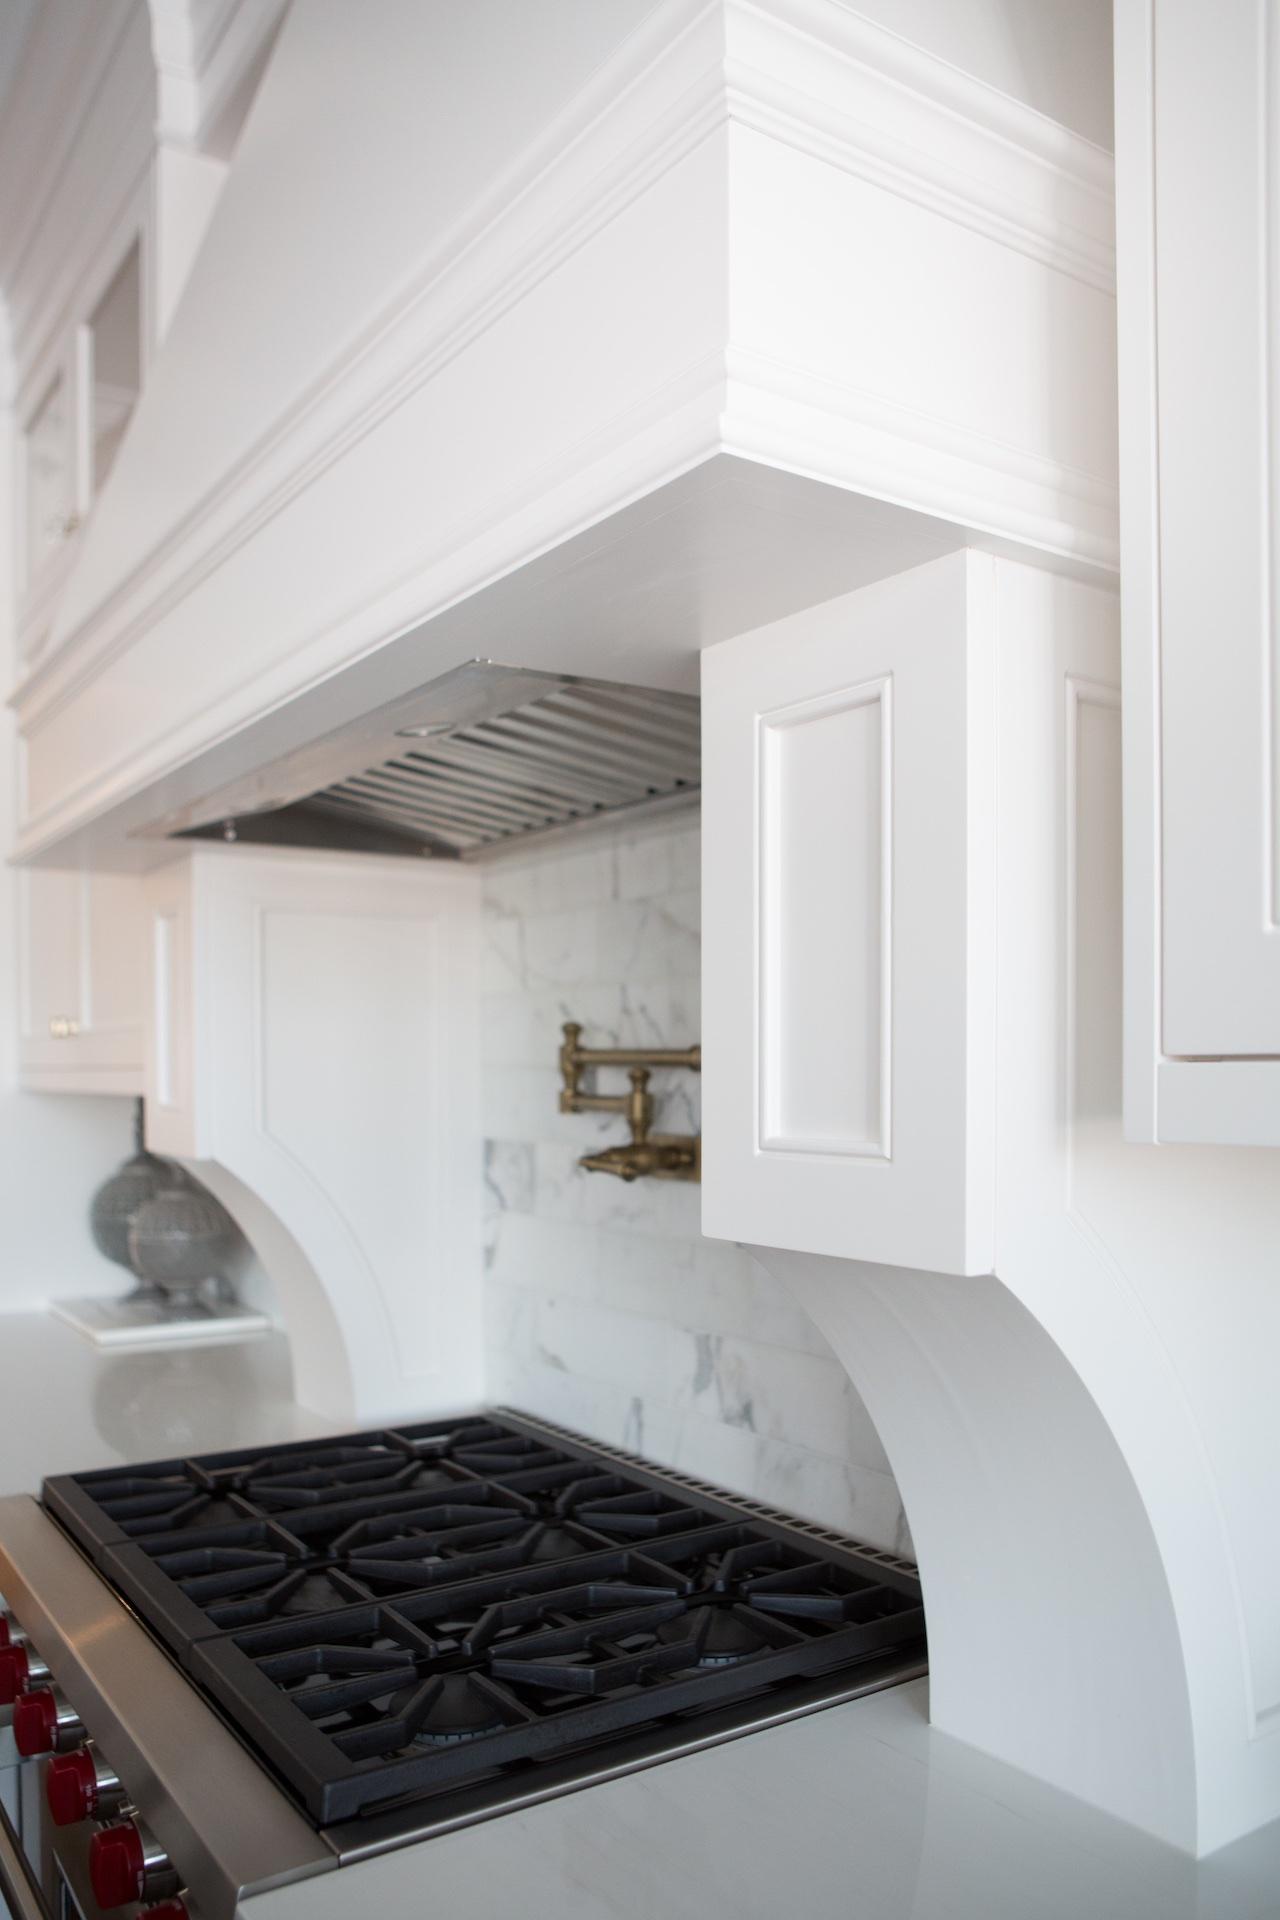 stove with wood hood fan